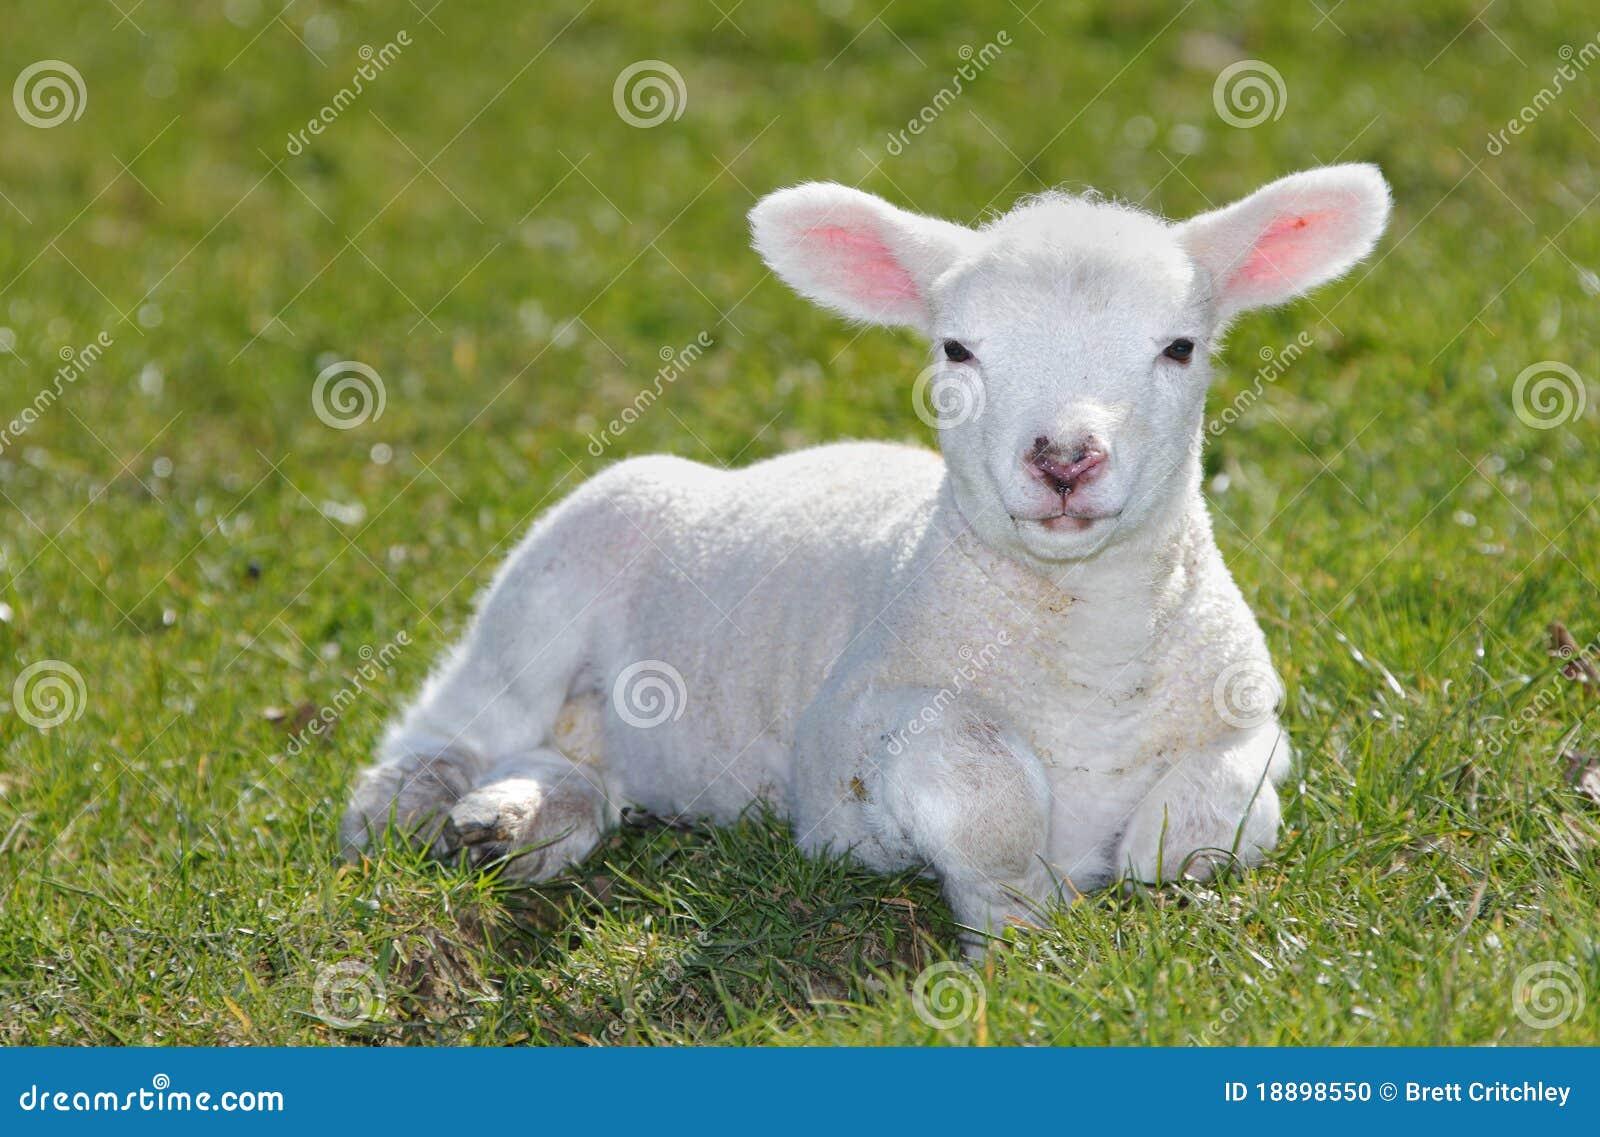 White Lamb Stock Photo - Image: 18898550